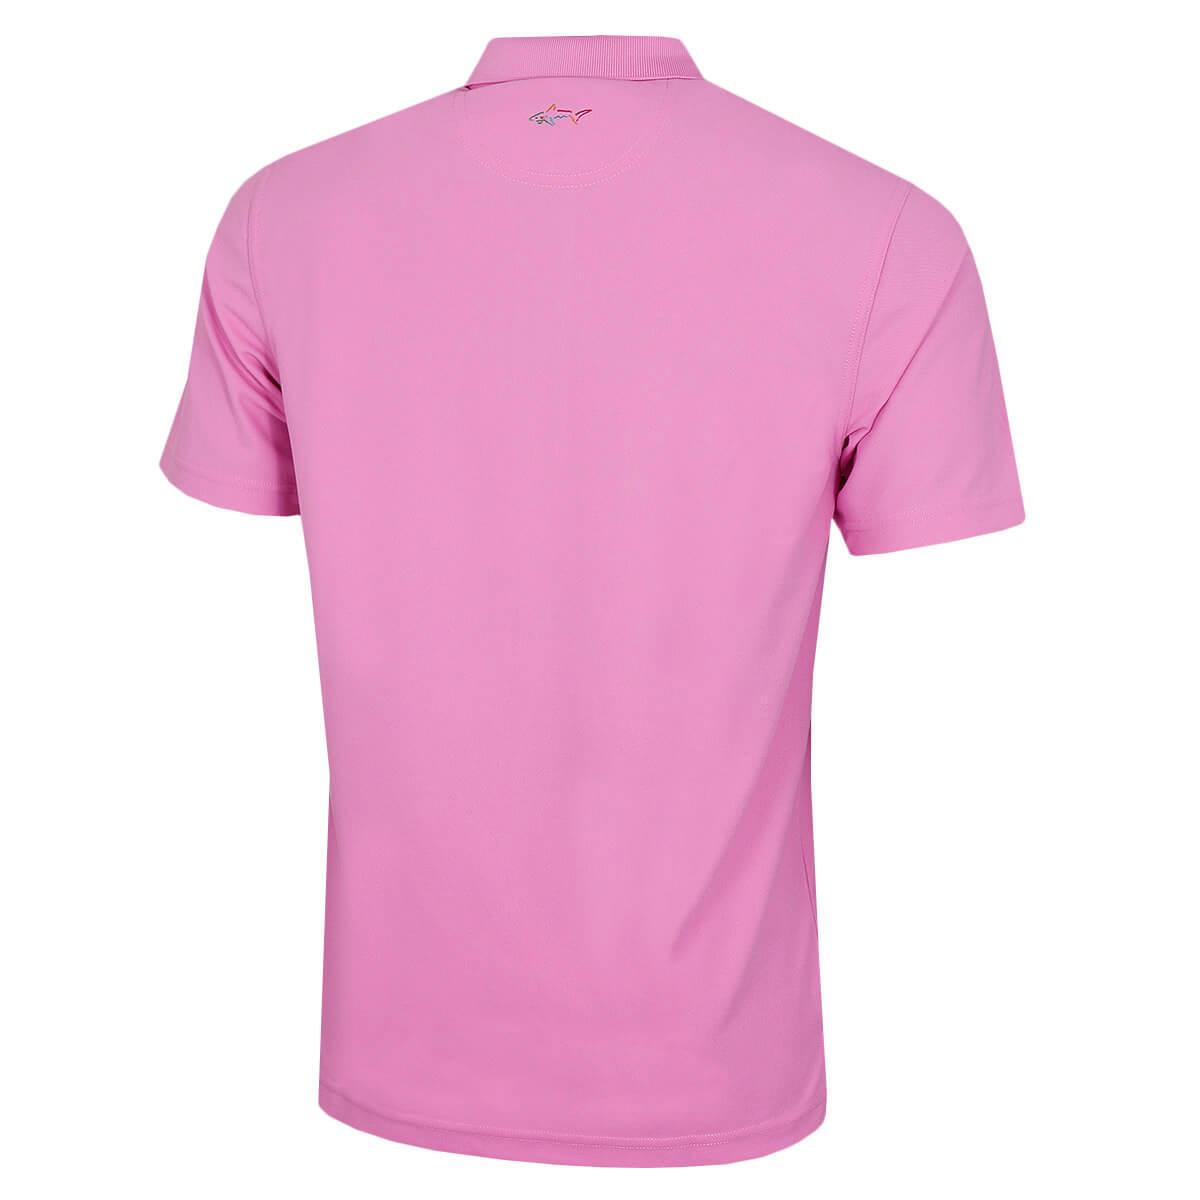 Greg-Norman-Mens-KX04-Performance-Micro-Pique-Golf-Polo-Shirt-28-OFF-RRP thumbnail 43